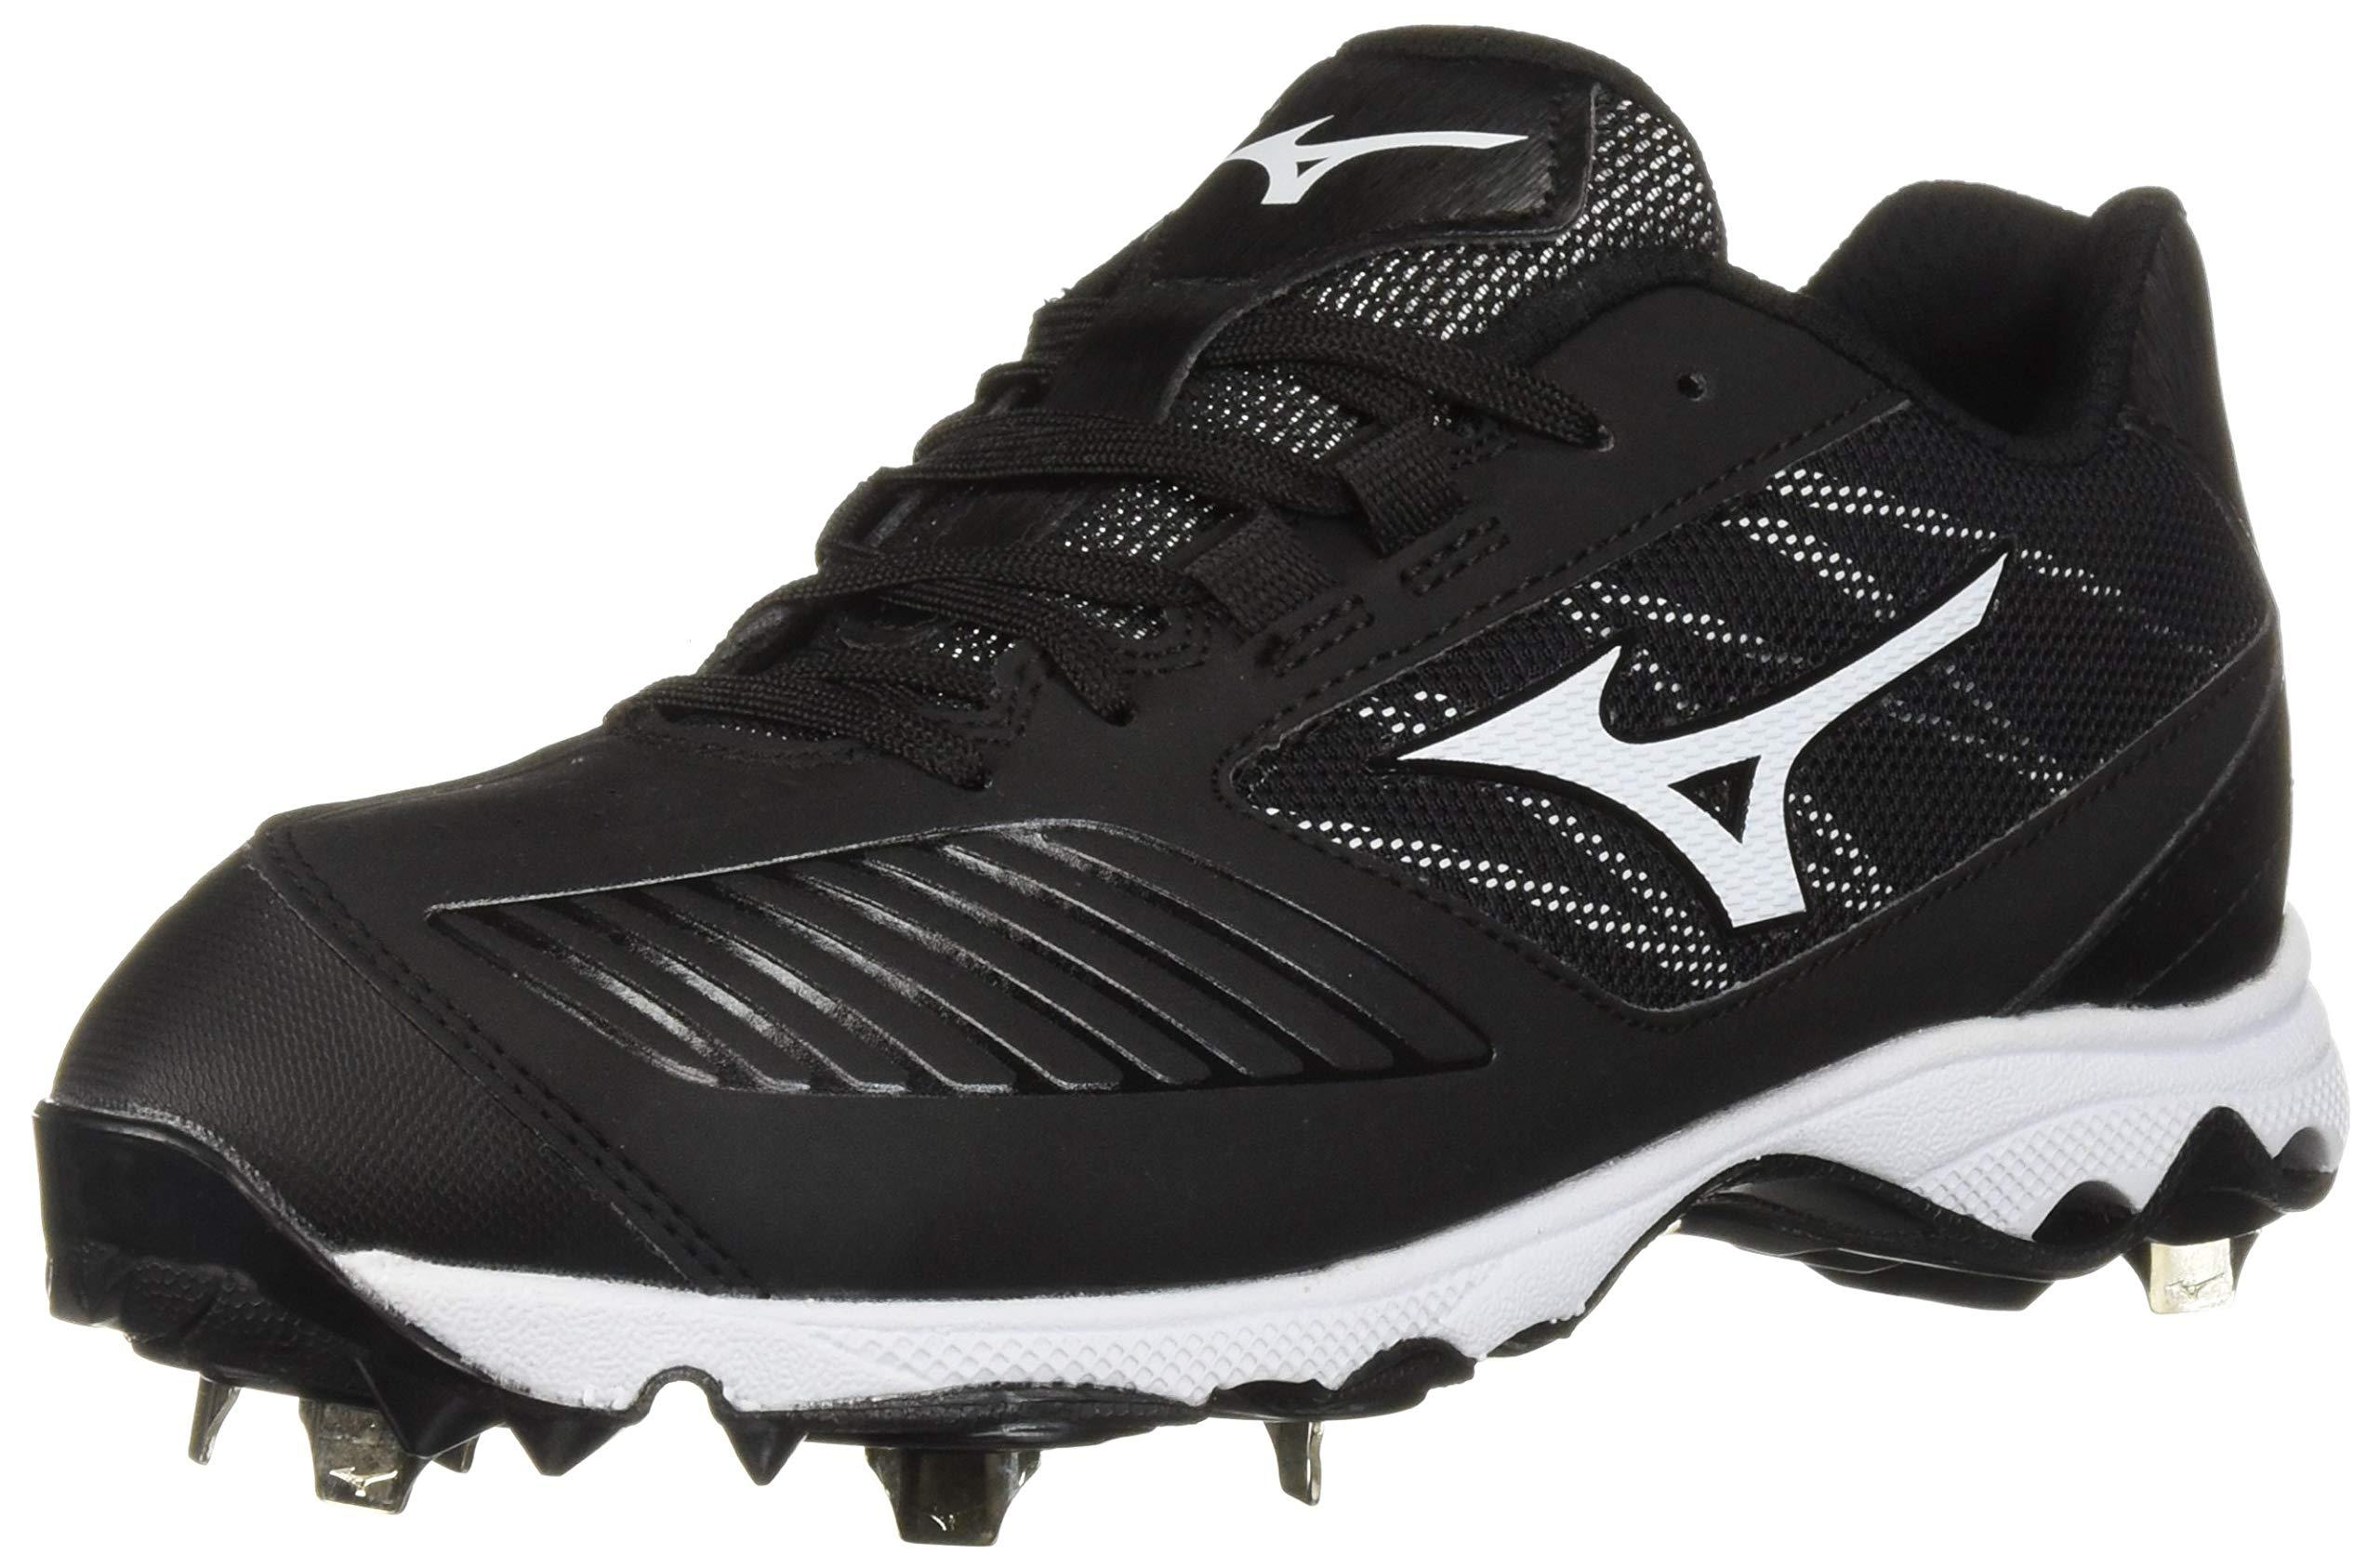 Mizuno Women's 9-Spike Advanced Sweep 4 Low Metal Cleat Softball Shoe, Black/White, 8 B US